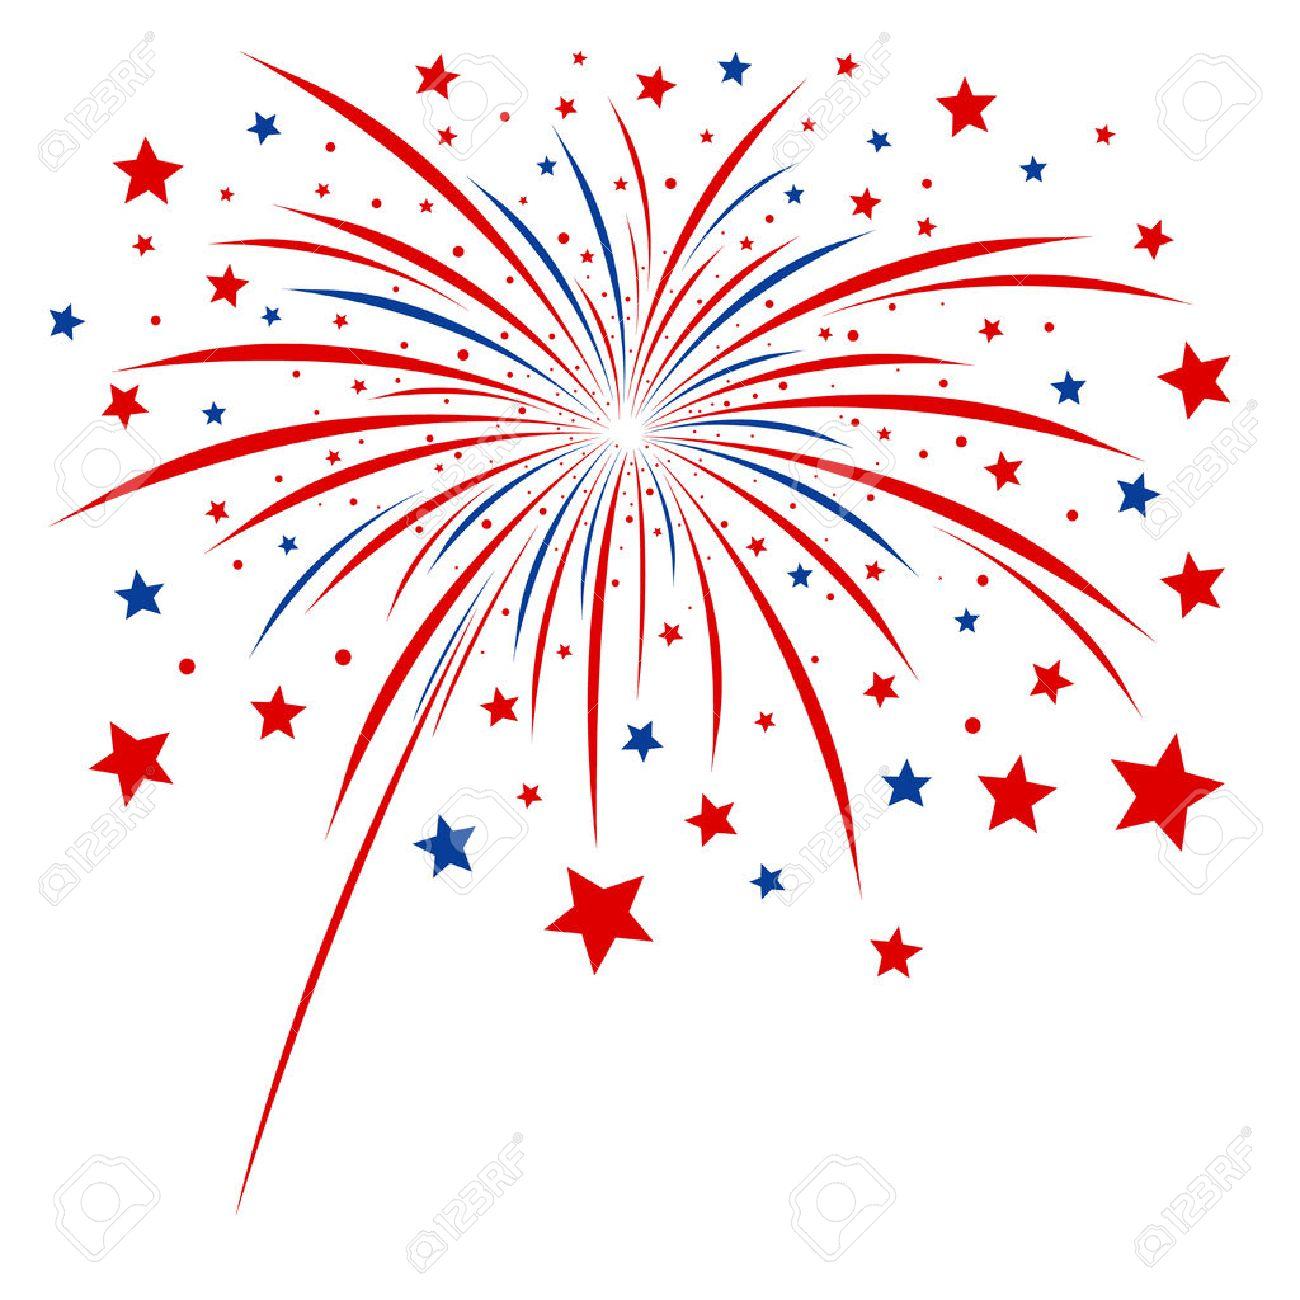 Firework design on white background - 24892836